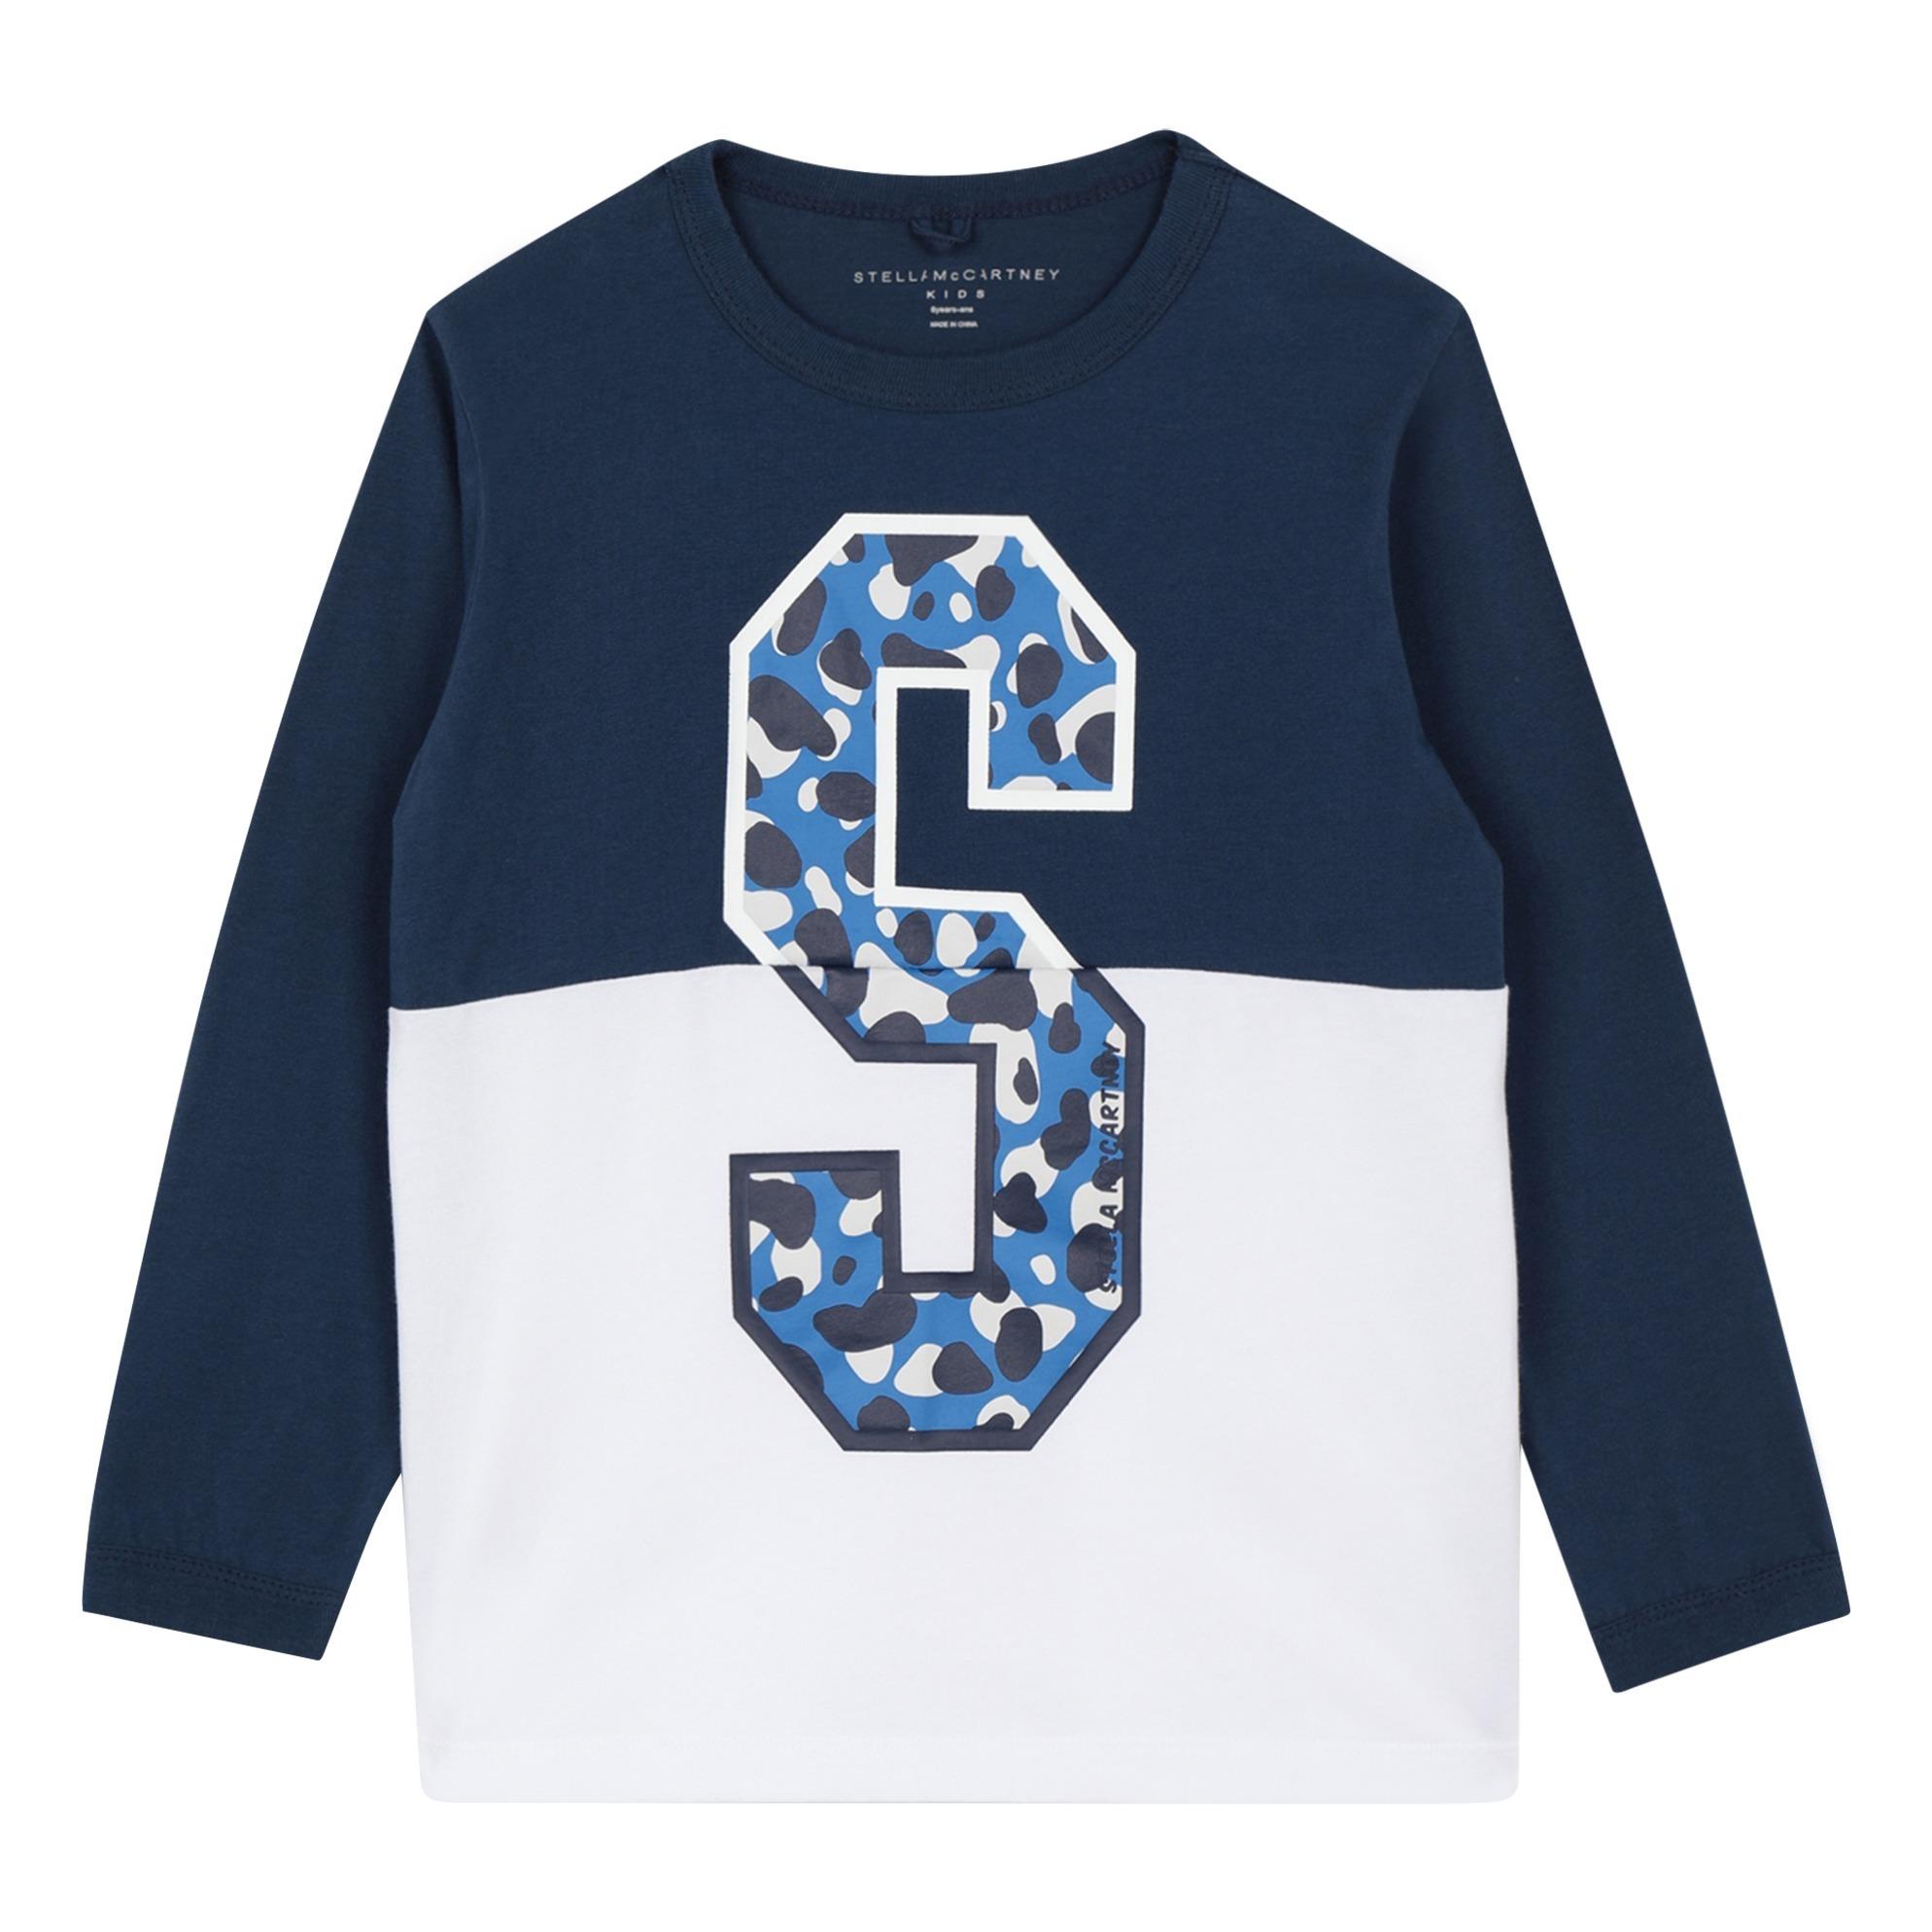 2a76db37836 Camo organic cotton T-shirt - Sport collection - Navy blue Stella